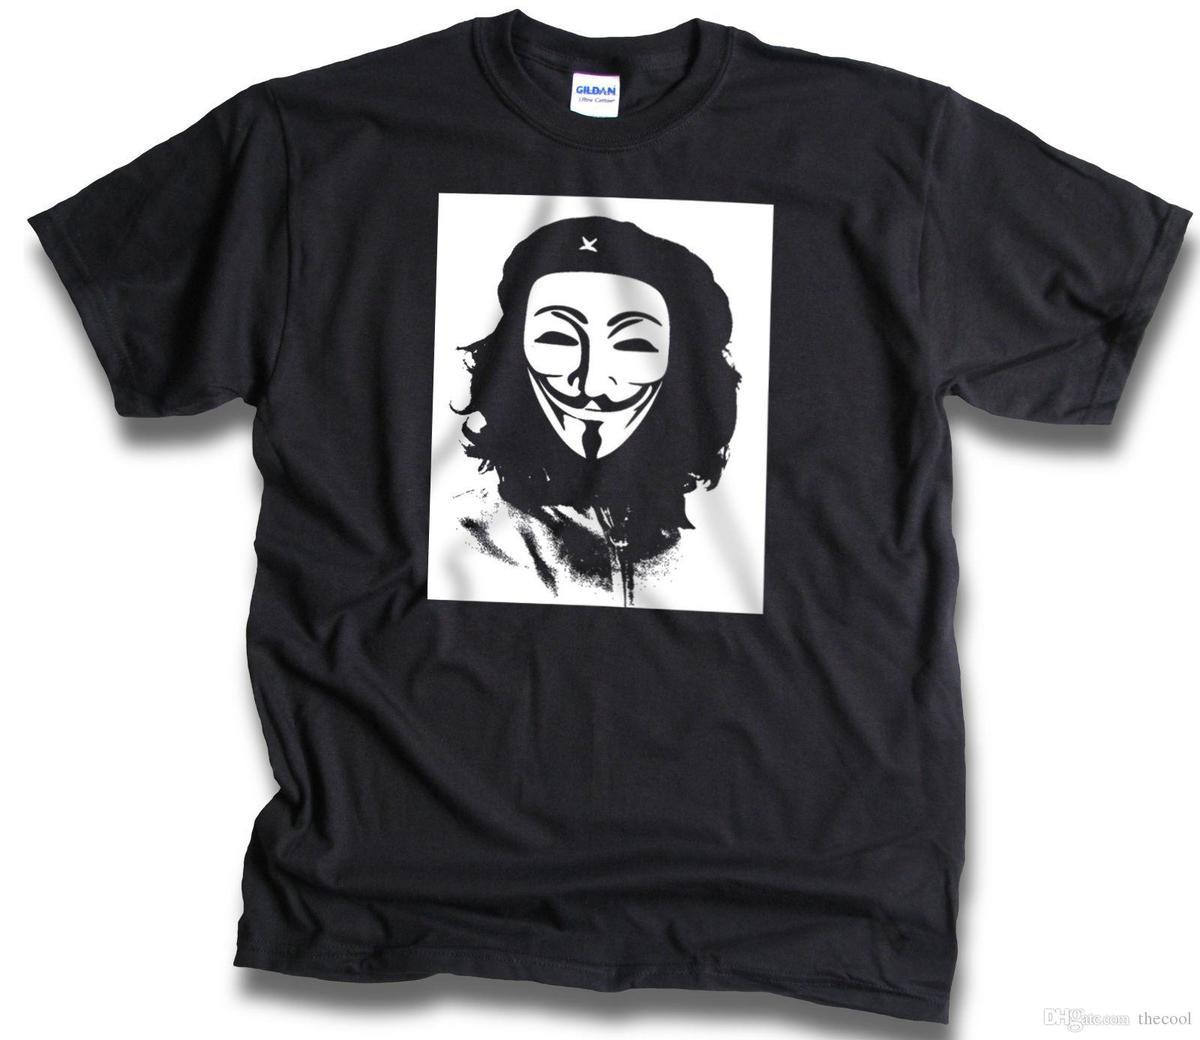 100% Baumwolle V Für Vendetta Sommer Männer T Shirt Film Hüfte Hop Oansatz Kurzarm Shirt Casual Fashion Top Tees Coole Mode Schmuck & Zubehör